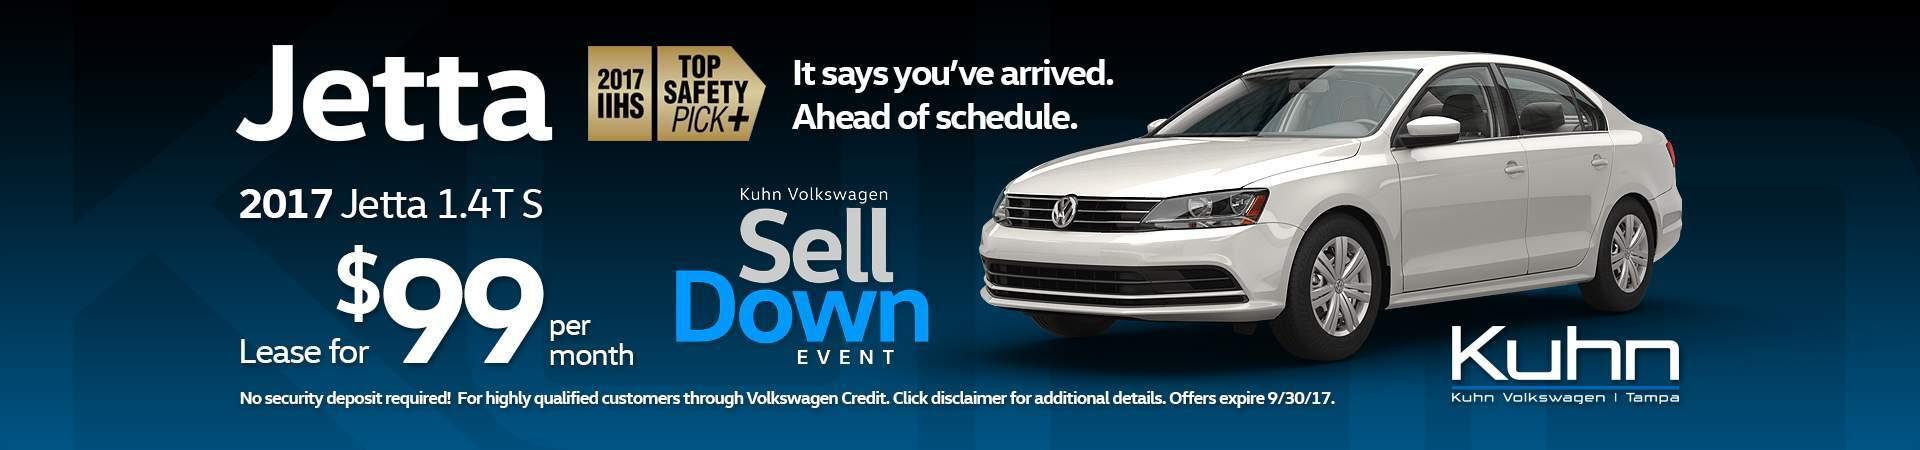 Jetta Lease $99 >> Volkswagen Dealership Tampa FL Used Cars Kuhn Volkswagen